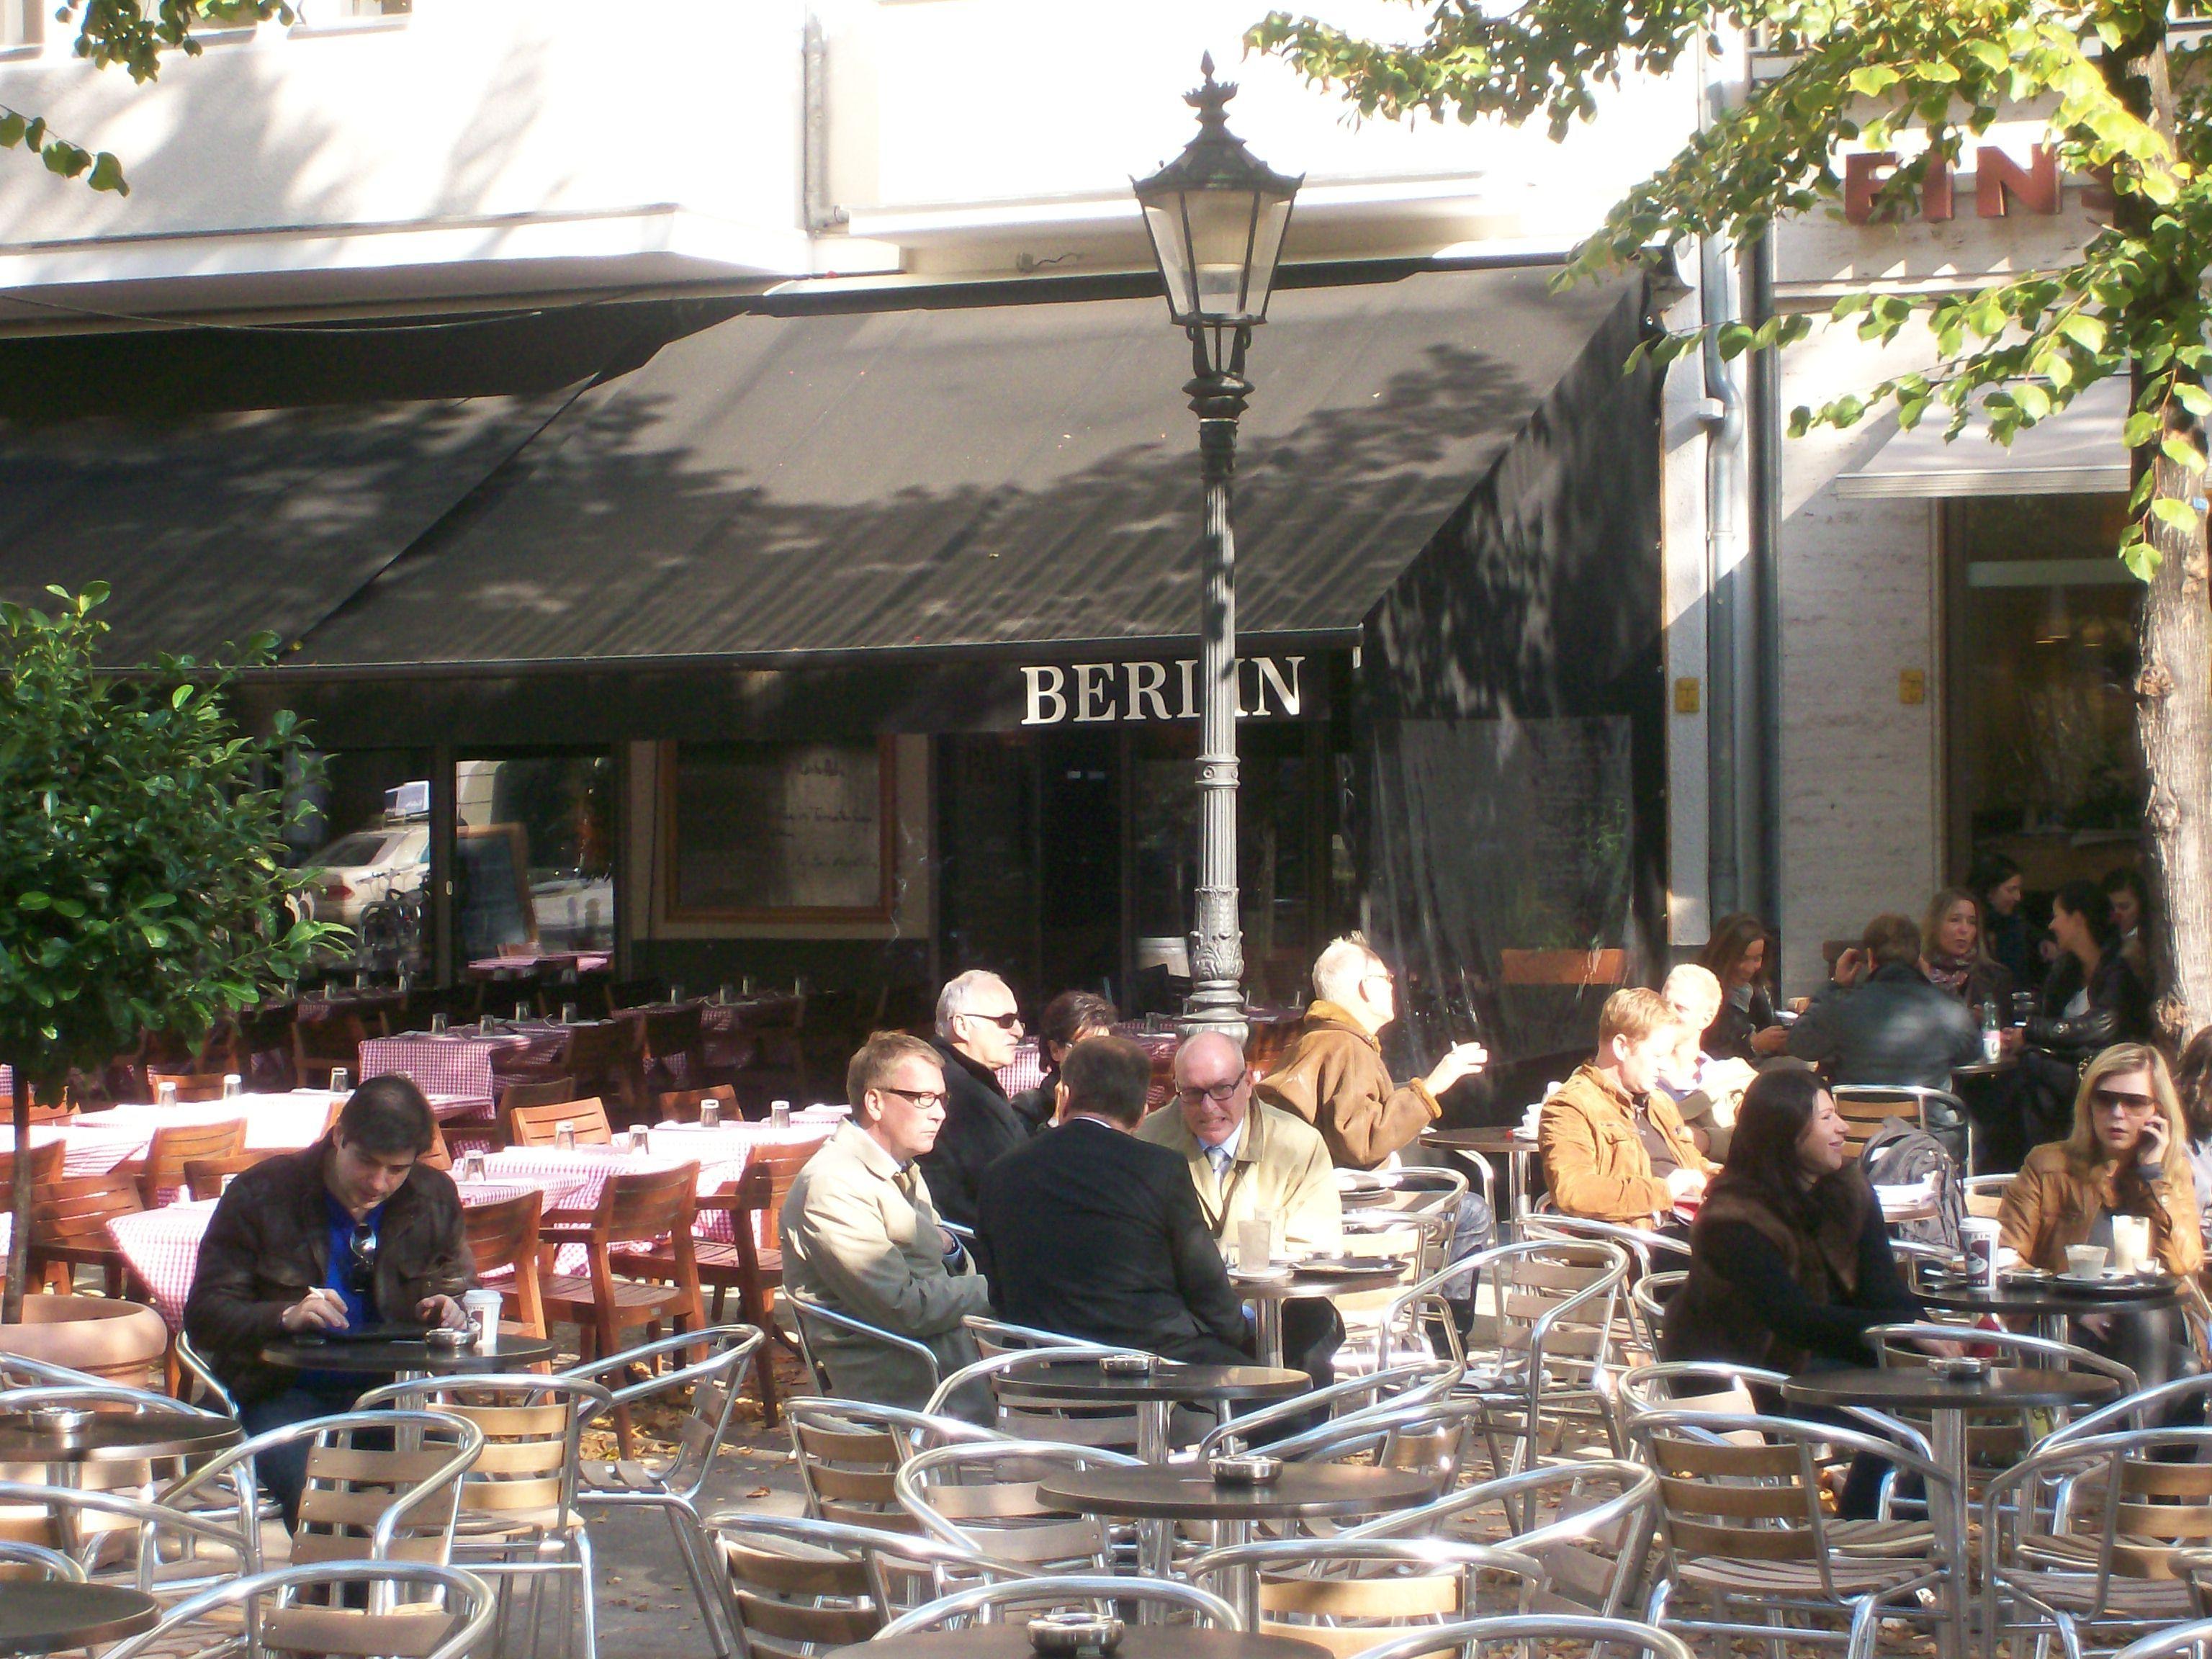 Cafe Berlin Charlottenburg Berlin, Charlottenburg, Cafe